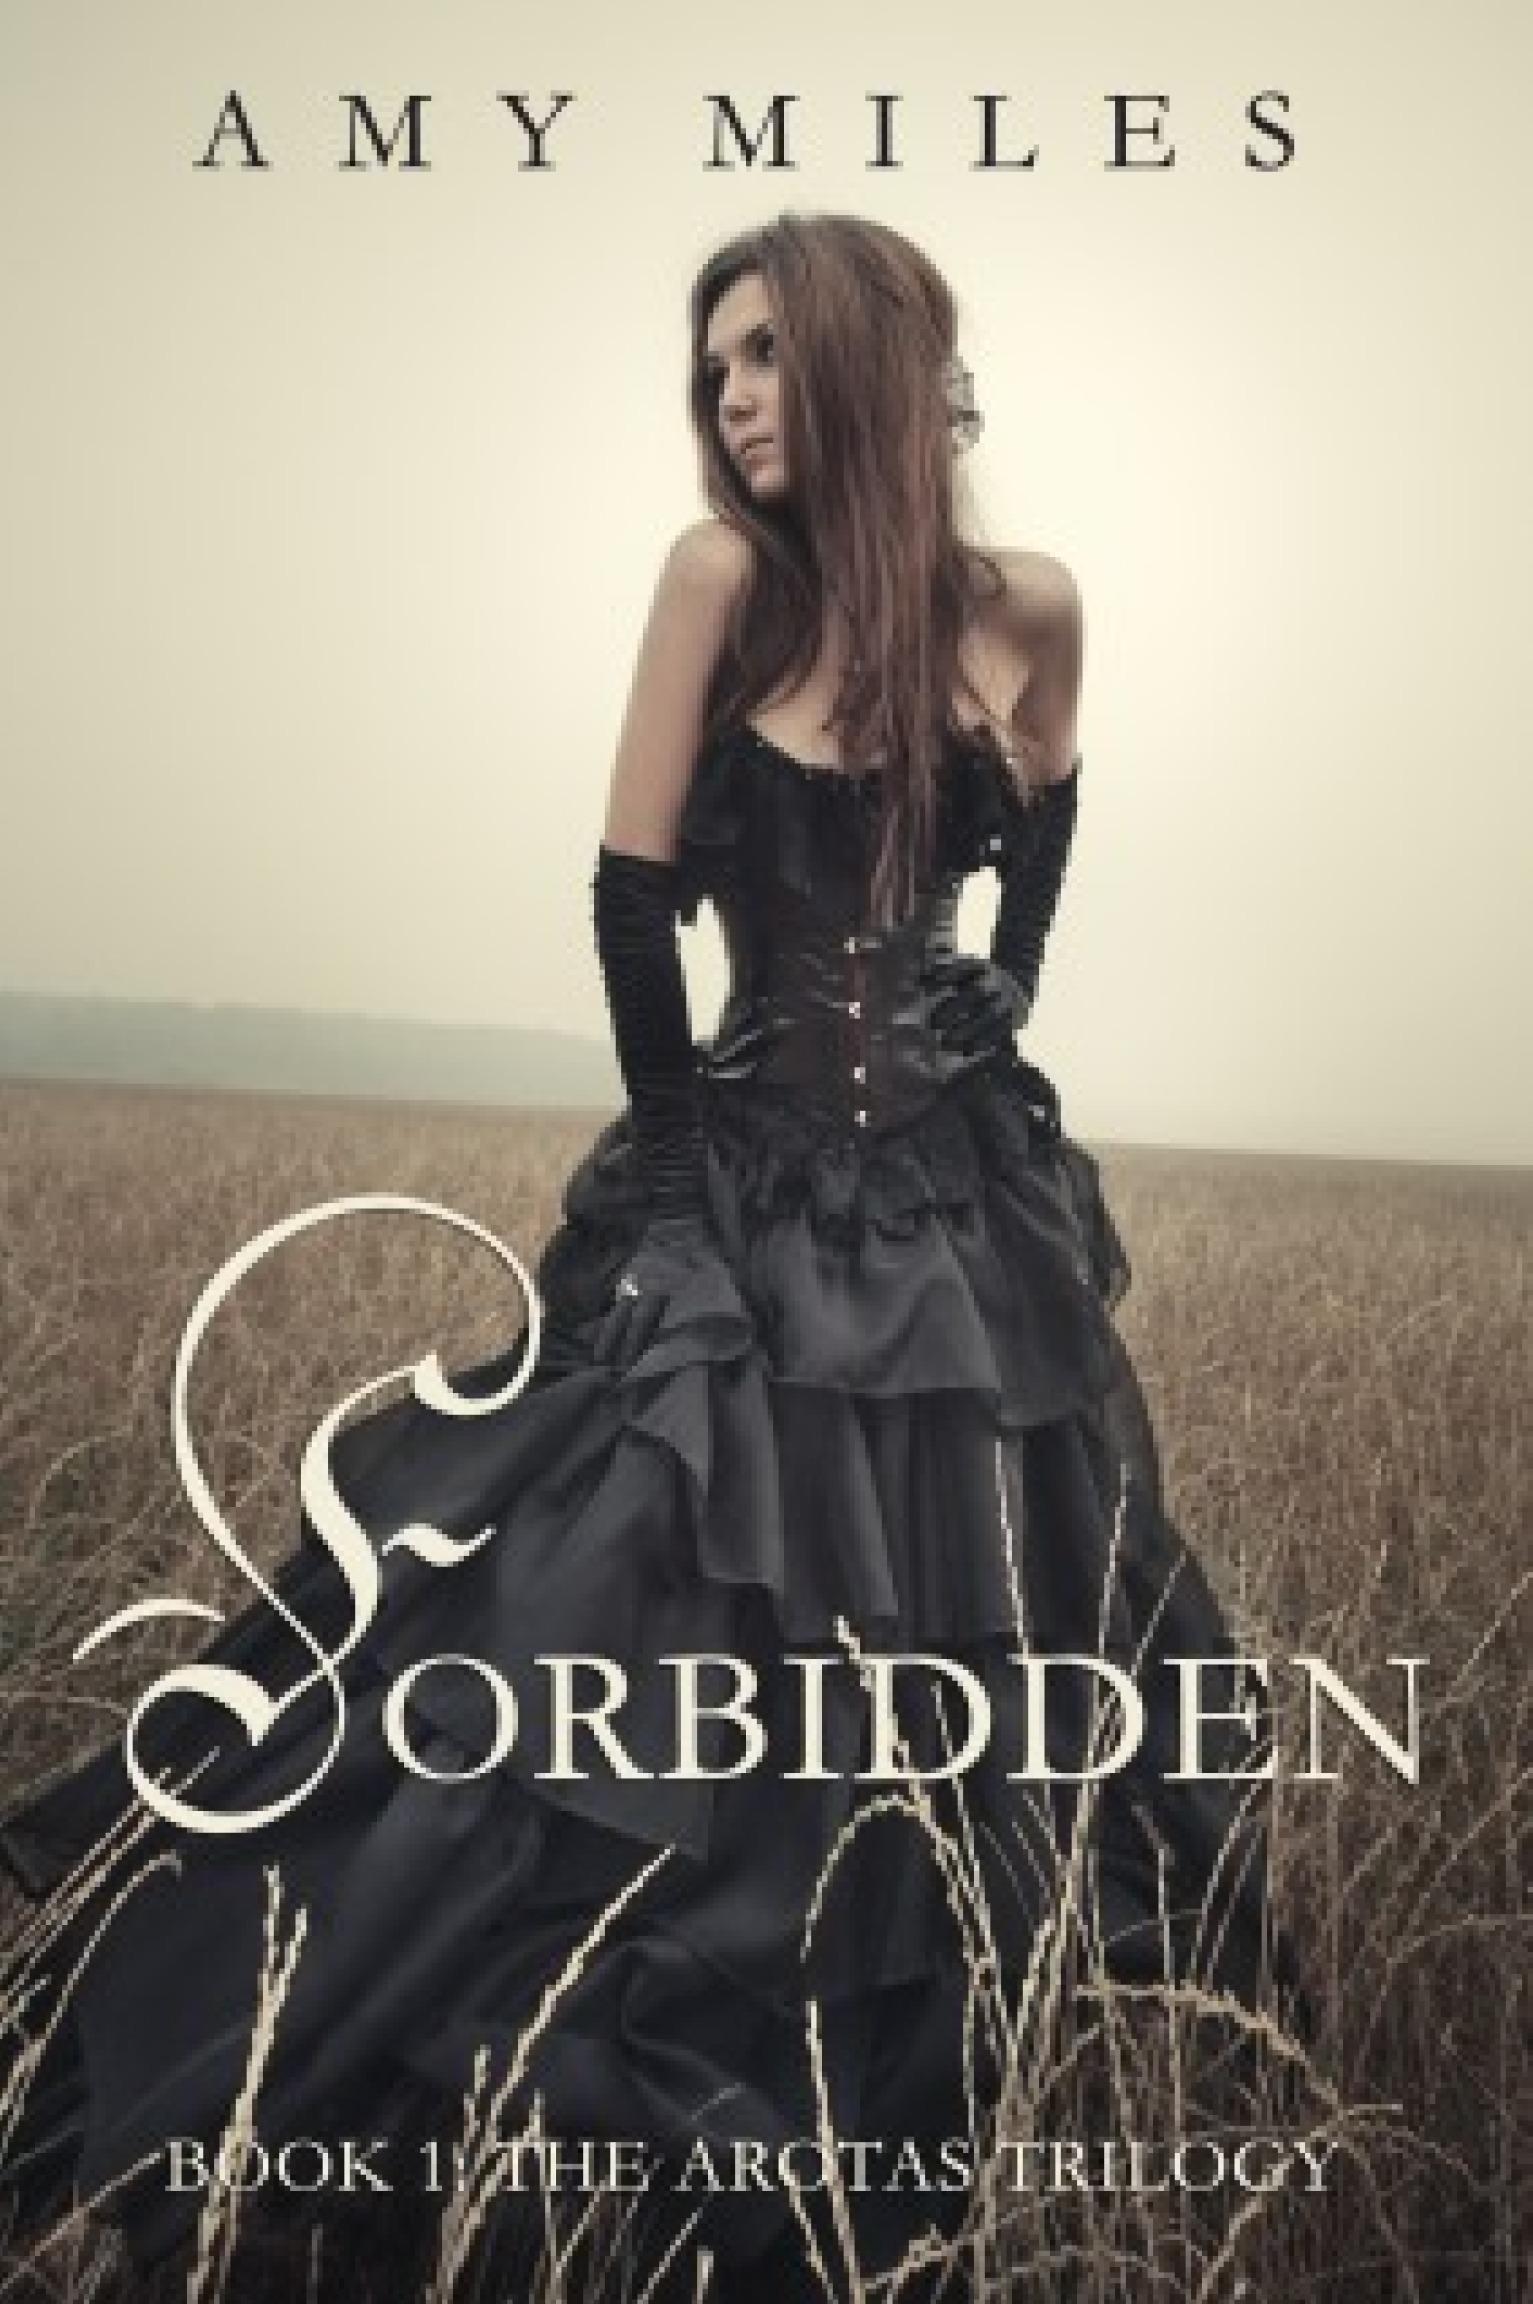 Forbidden: The Arotas Series, Book 1 (sst-ccxxxiv)